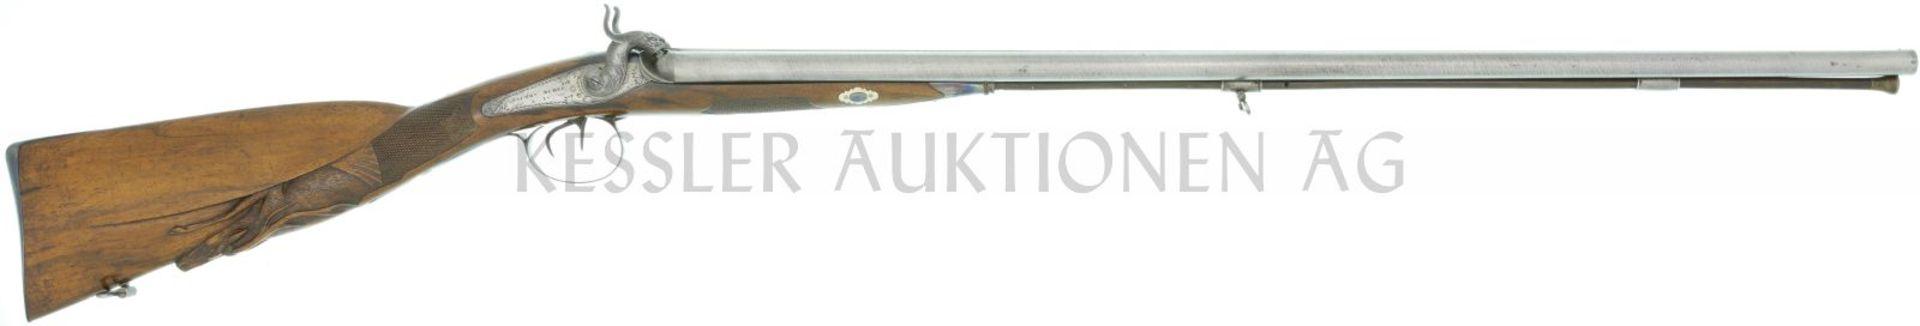 Perkussionsflinte, Saumon Dubuc, Kal. 20 LL 775mm, TL 1210mm, Damastläufe, blank poliert. Konkave,